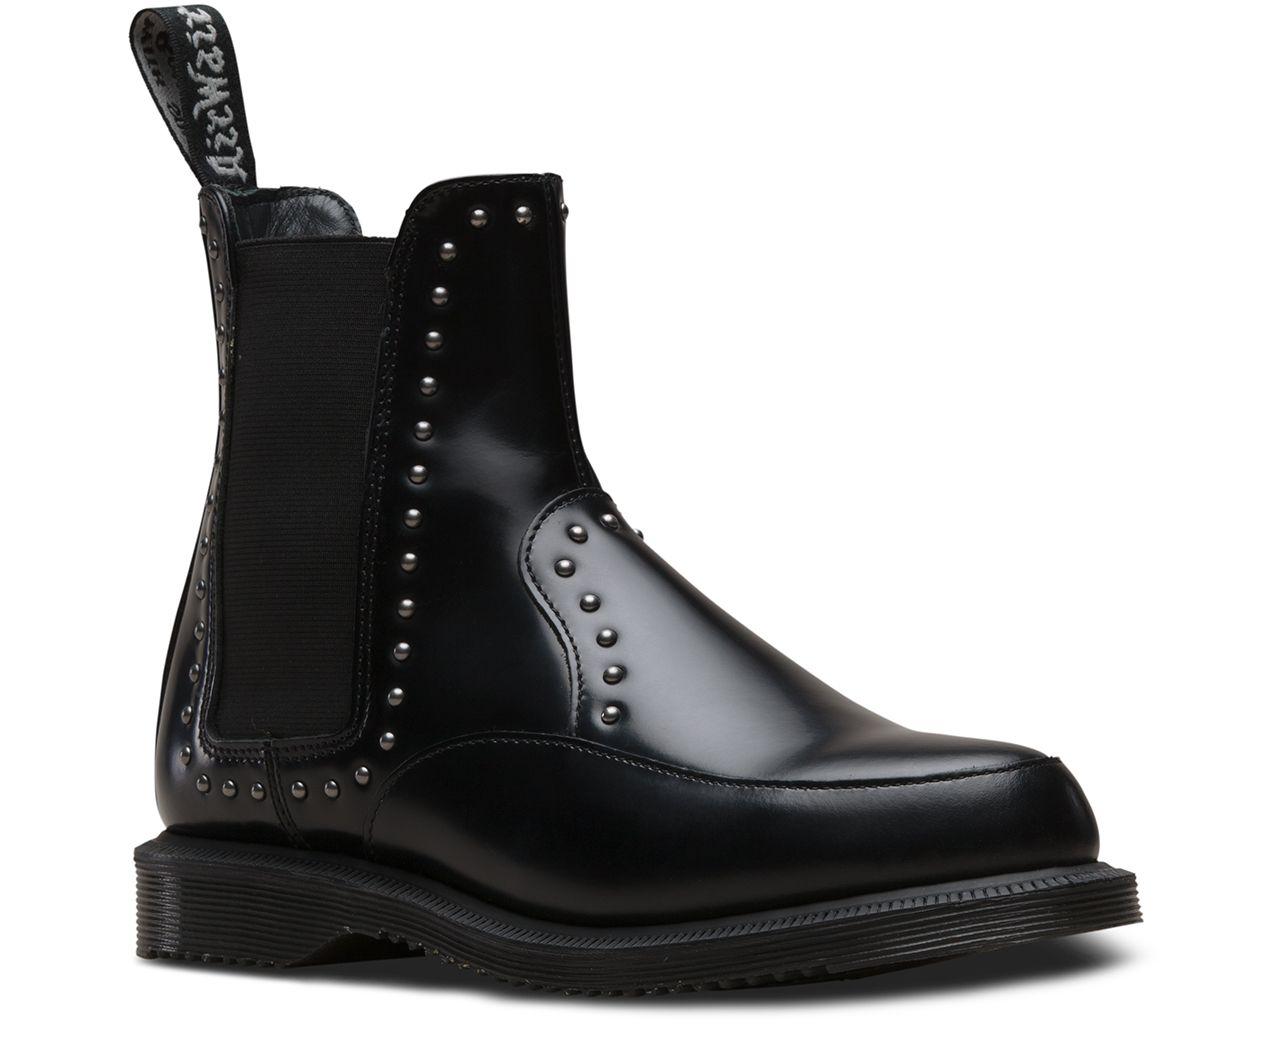 Kaufen Neue Mens Winter Herbst Stiefel Nieten Stud